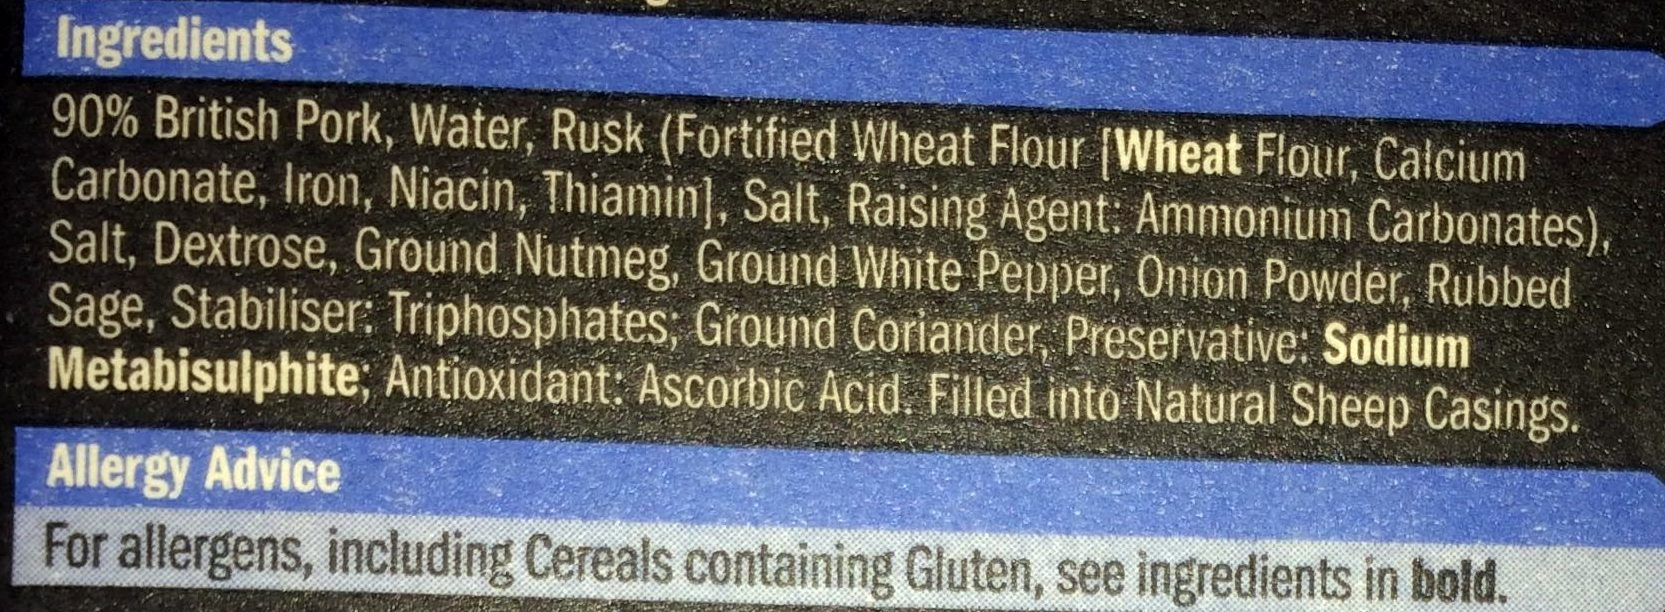 10 pork chipolatas - Ingredients